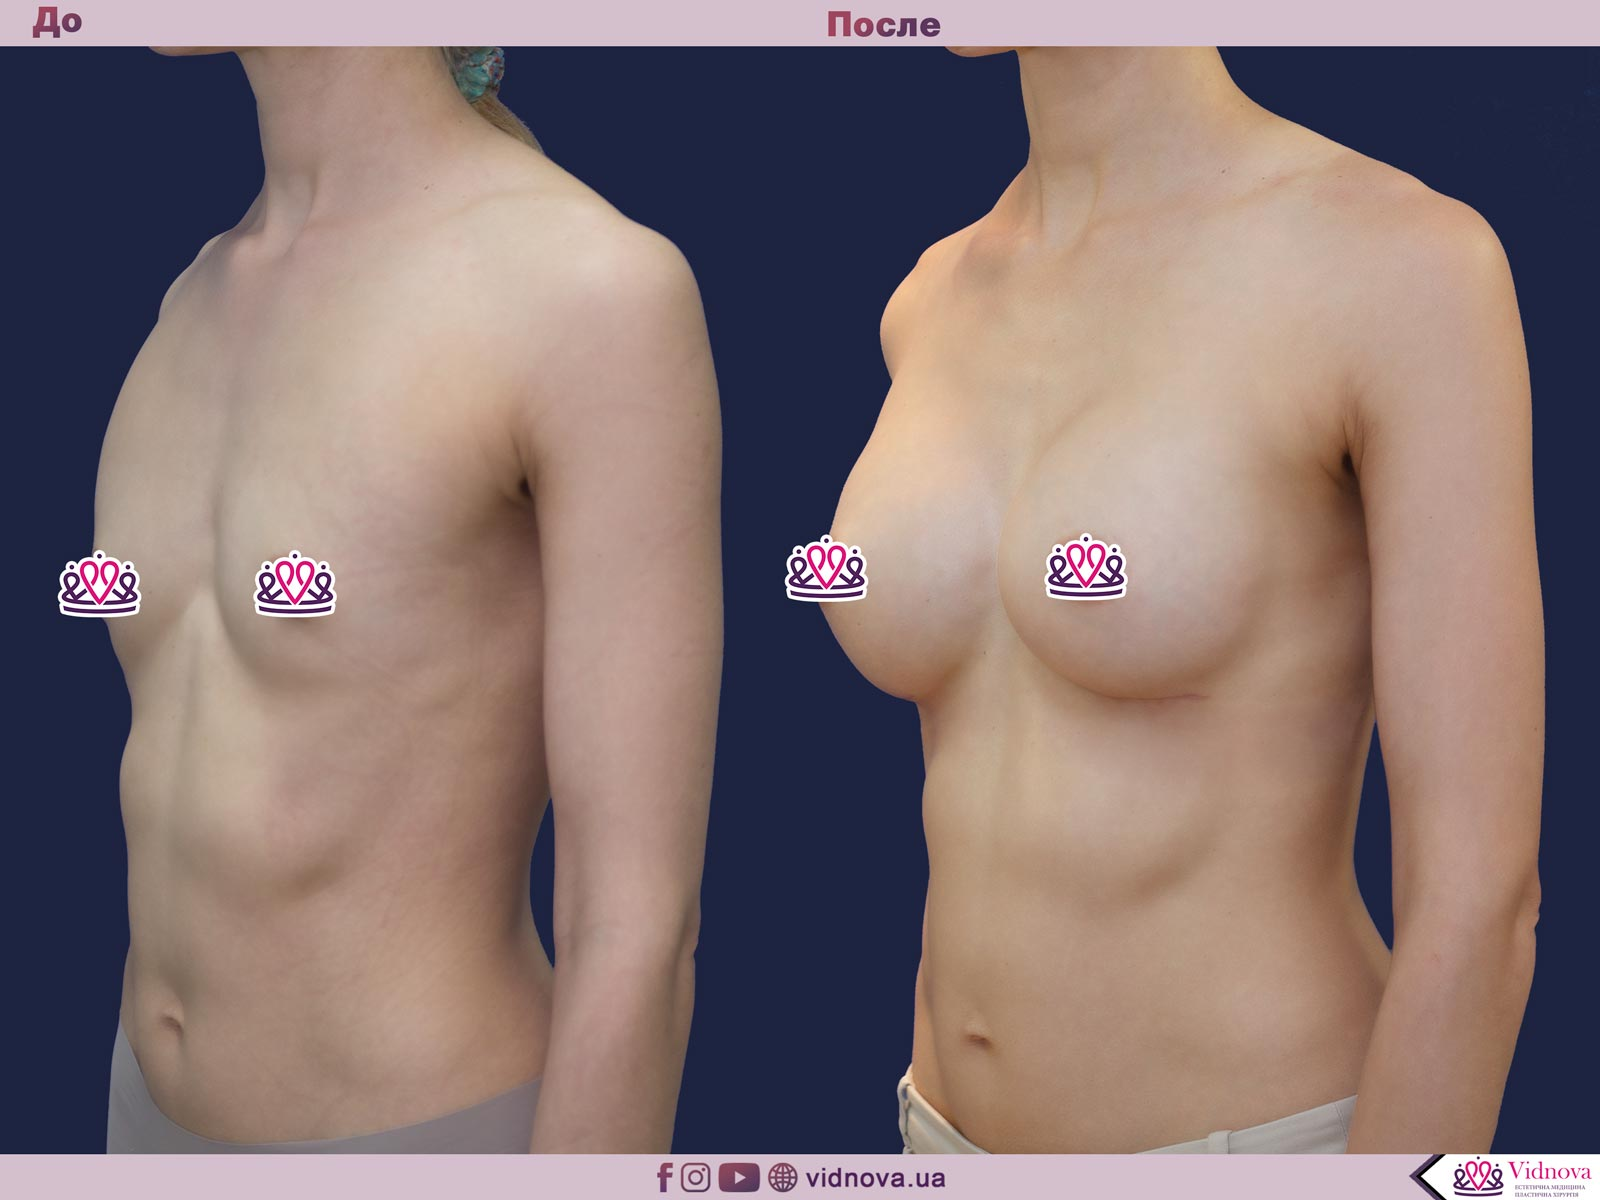 Увеличение груди: Фото ДО и ПОСЛЕ - Пример №52-2 - Клиника Vidnova